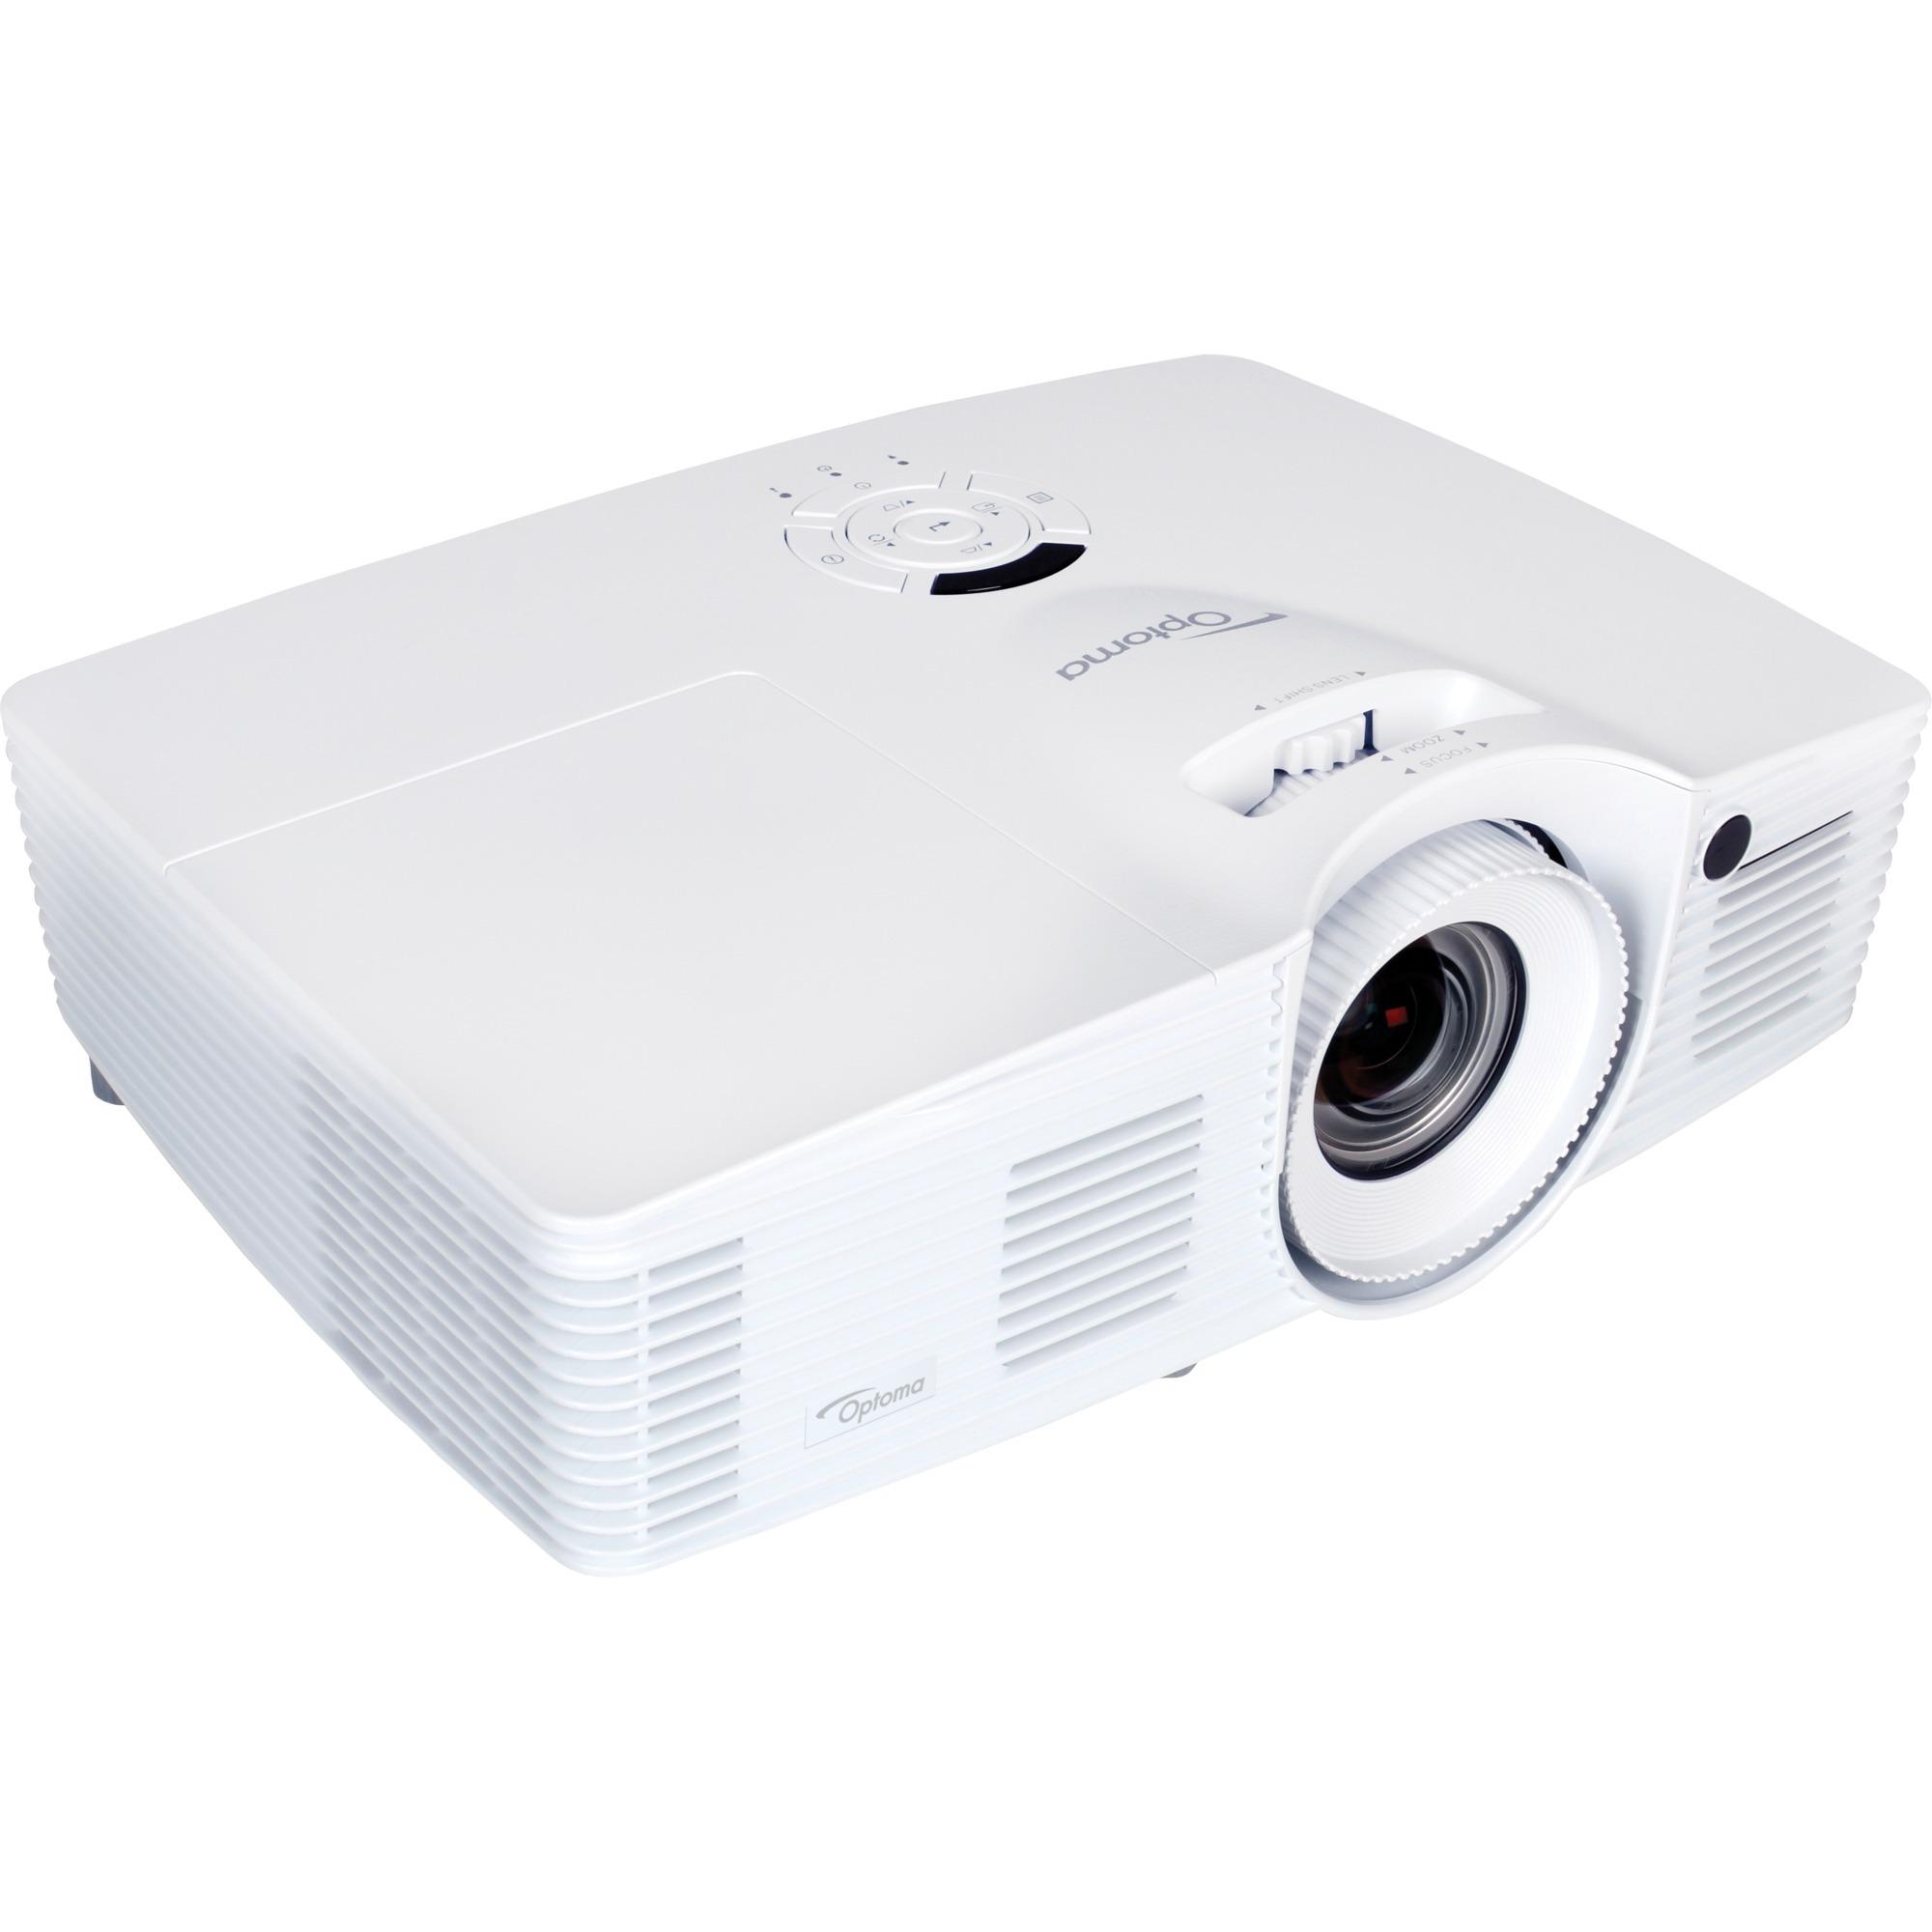 DH401 Proyector para escritorio 4000lúmenes ANSI DLP 1080p (1920x1080) 3D Blanco videoproyector, Proyector DLP